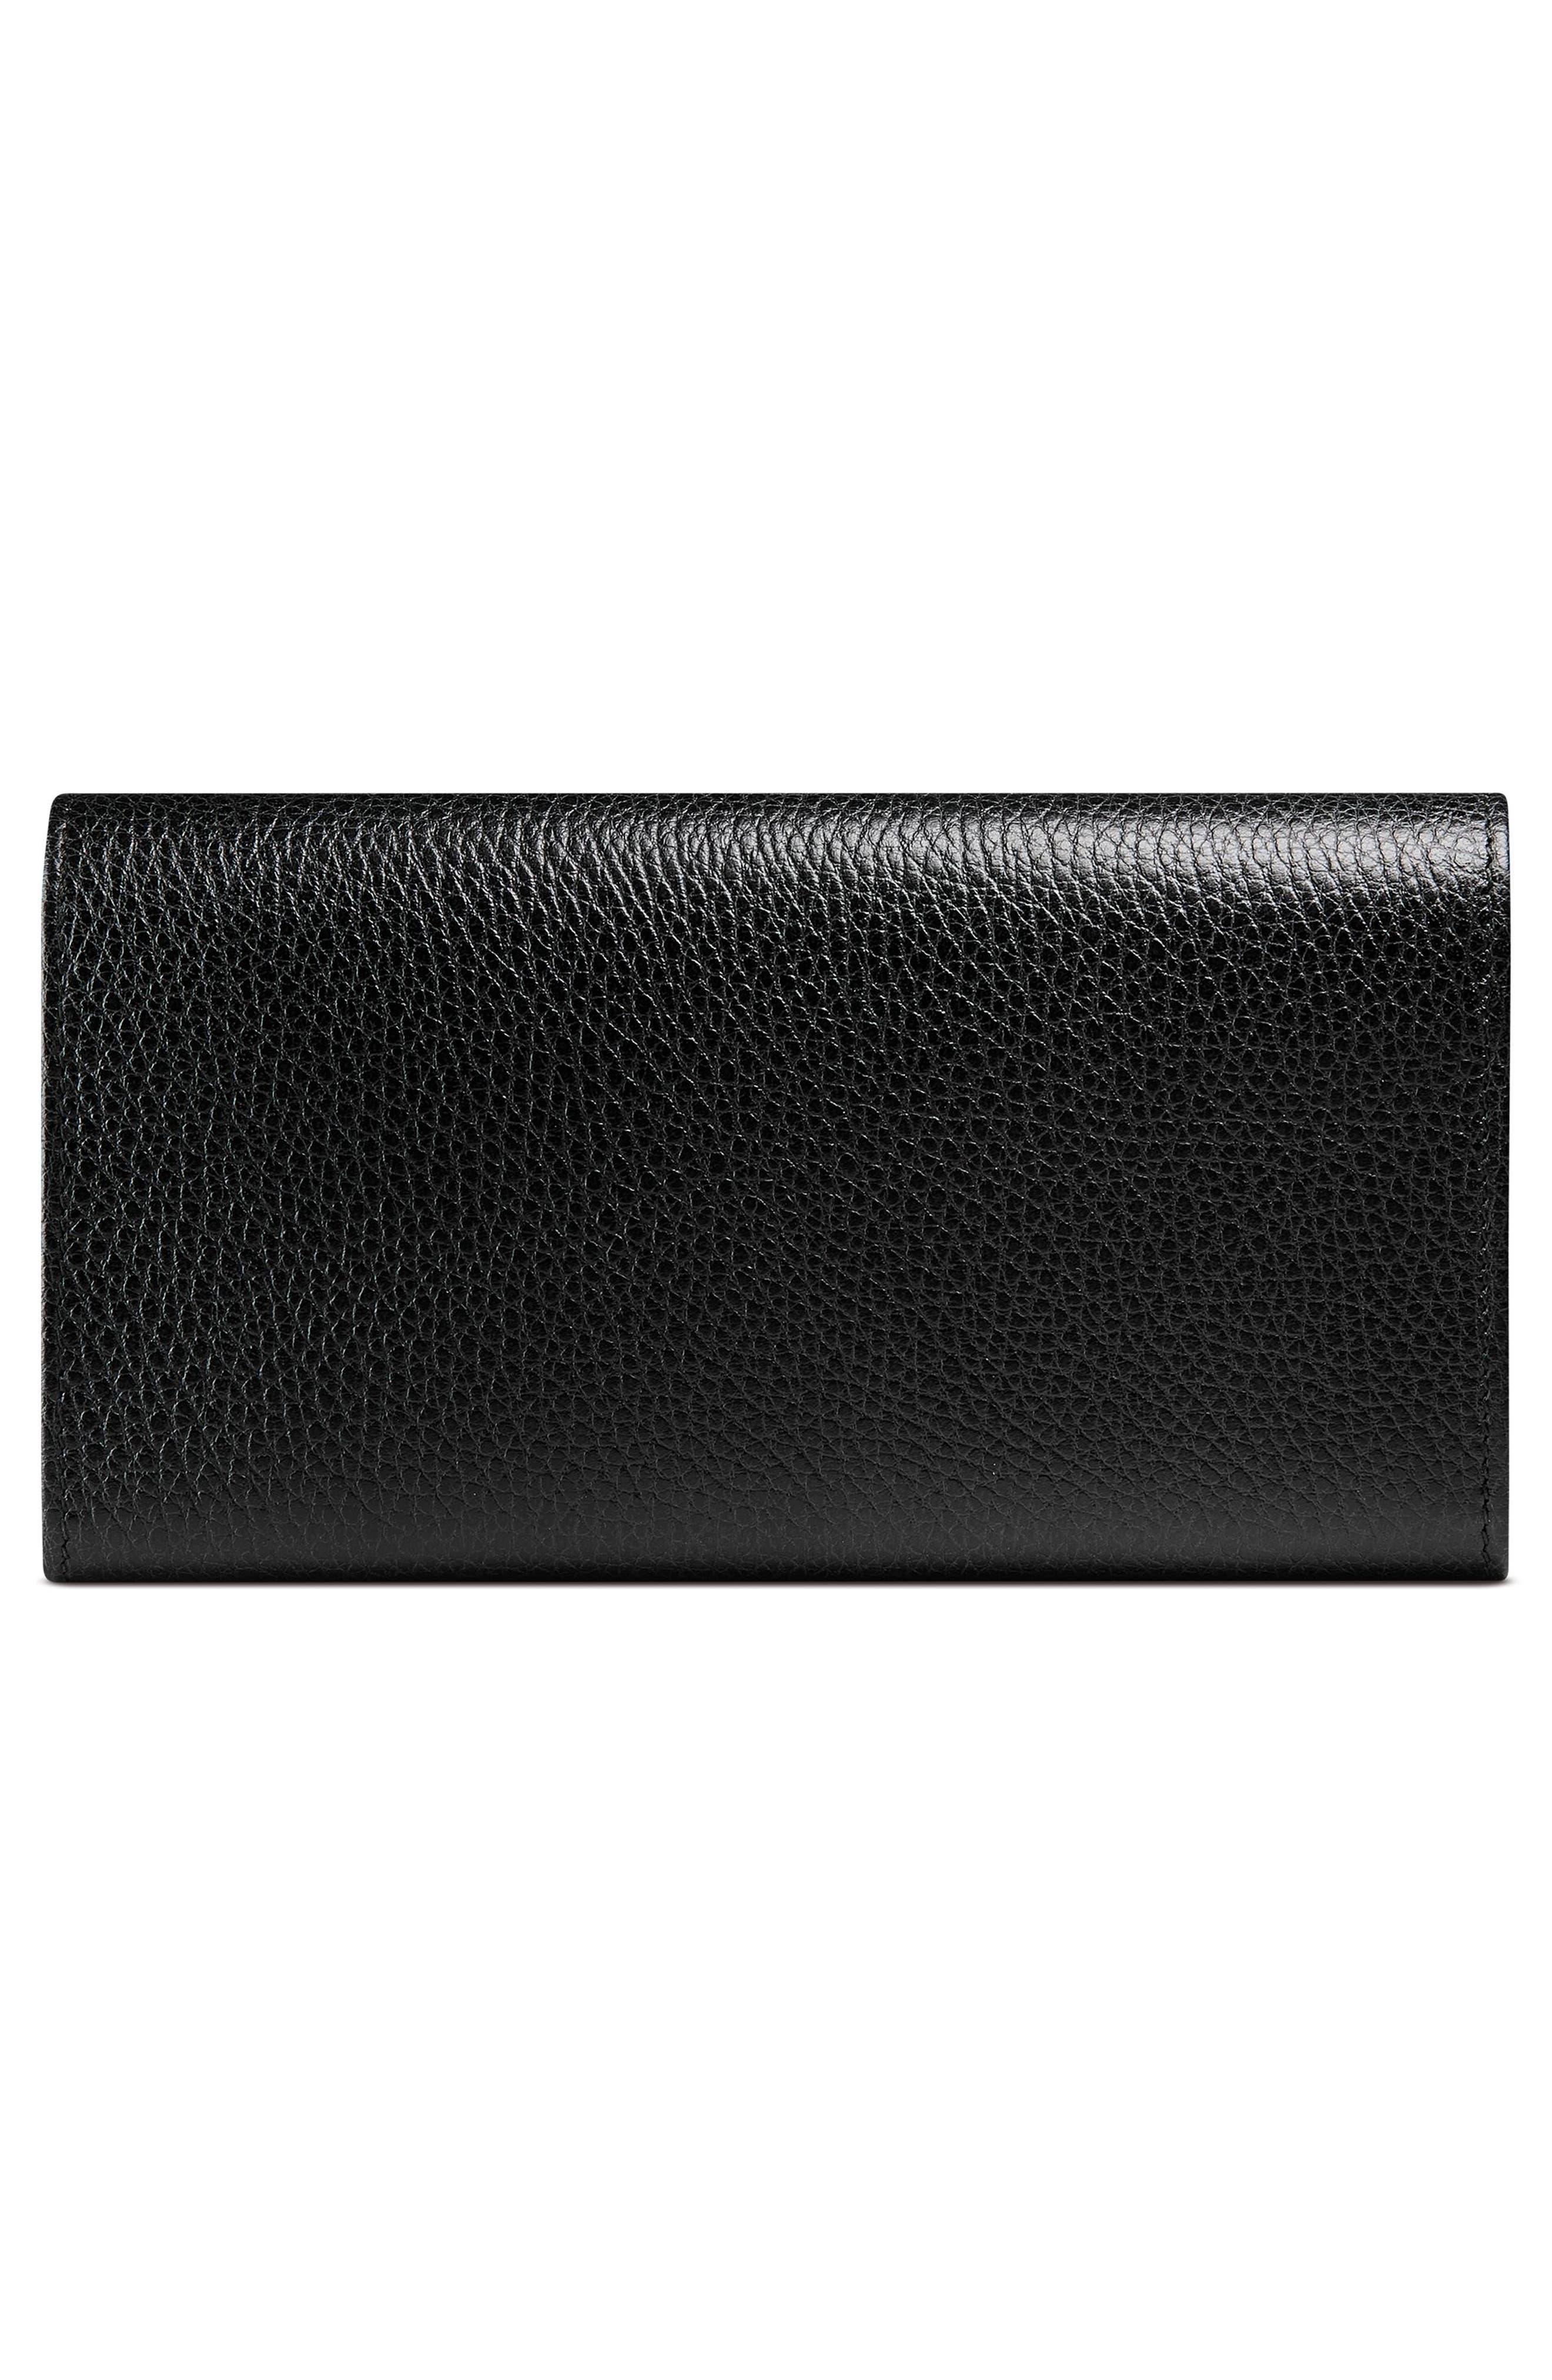 Petite Marmont Leather Continental Wallet,                             Alternate thumbnail 3, color,                             NERO/ NERO